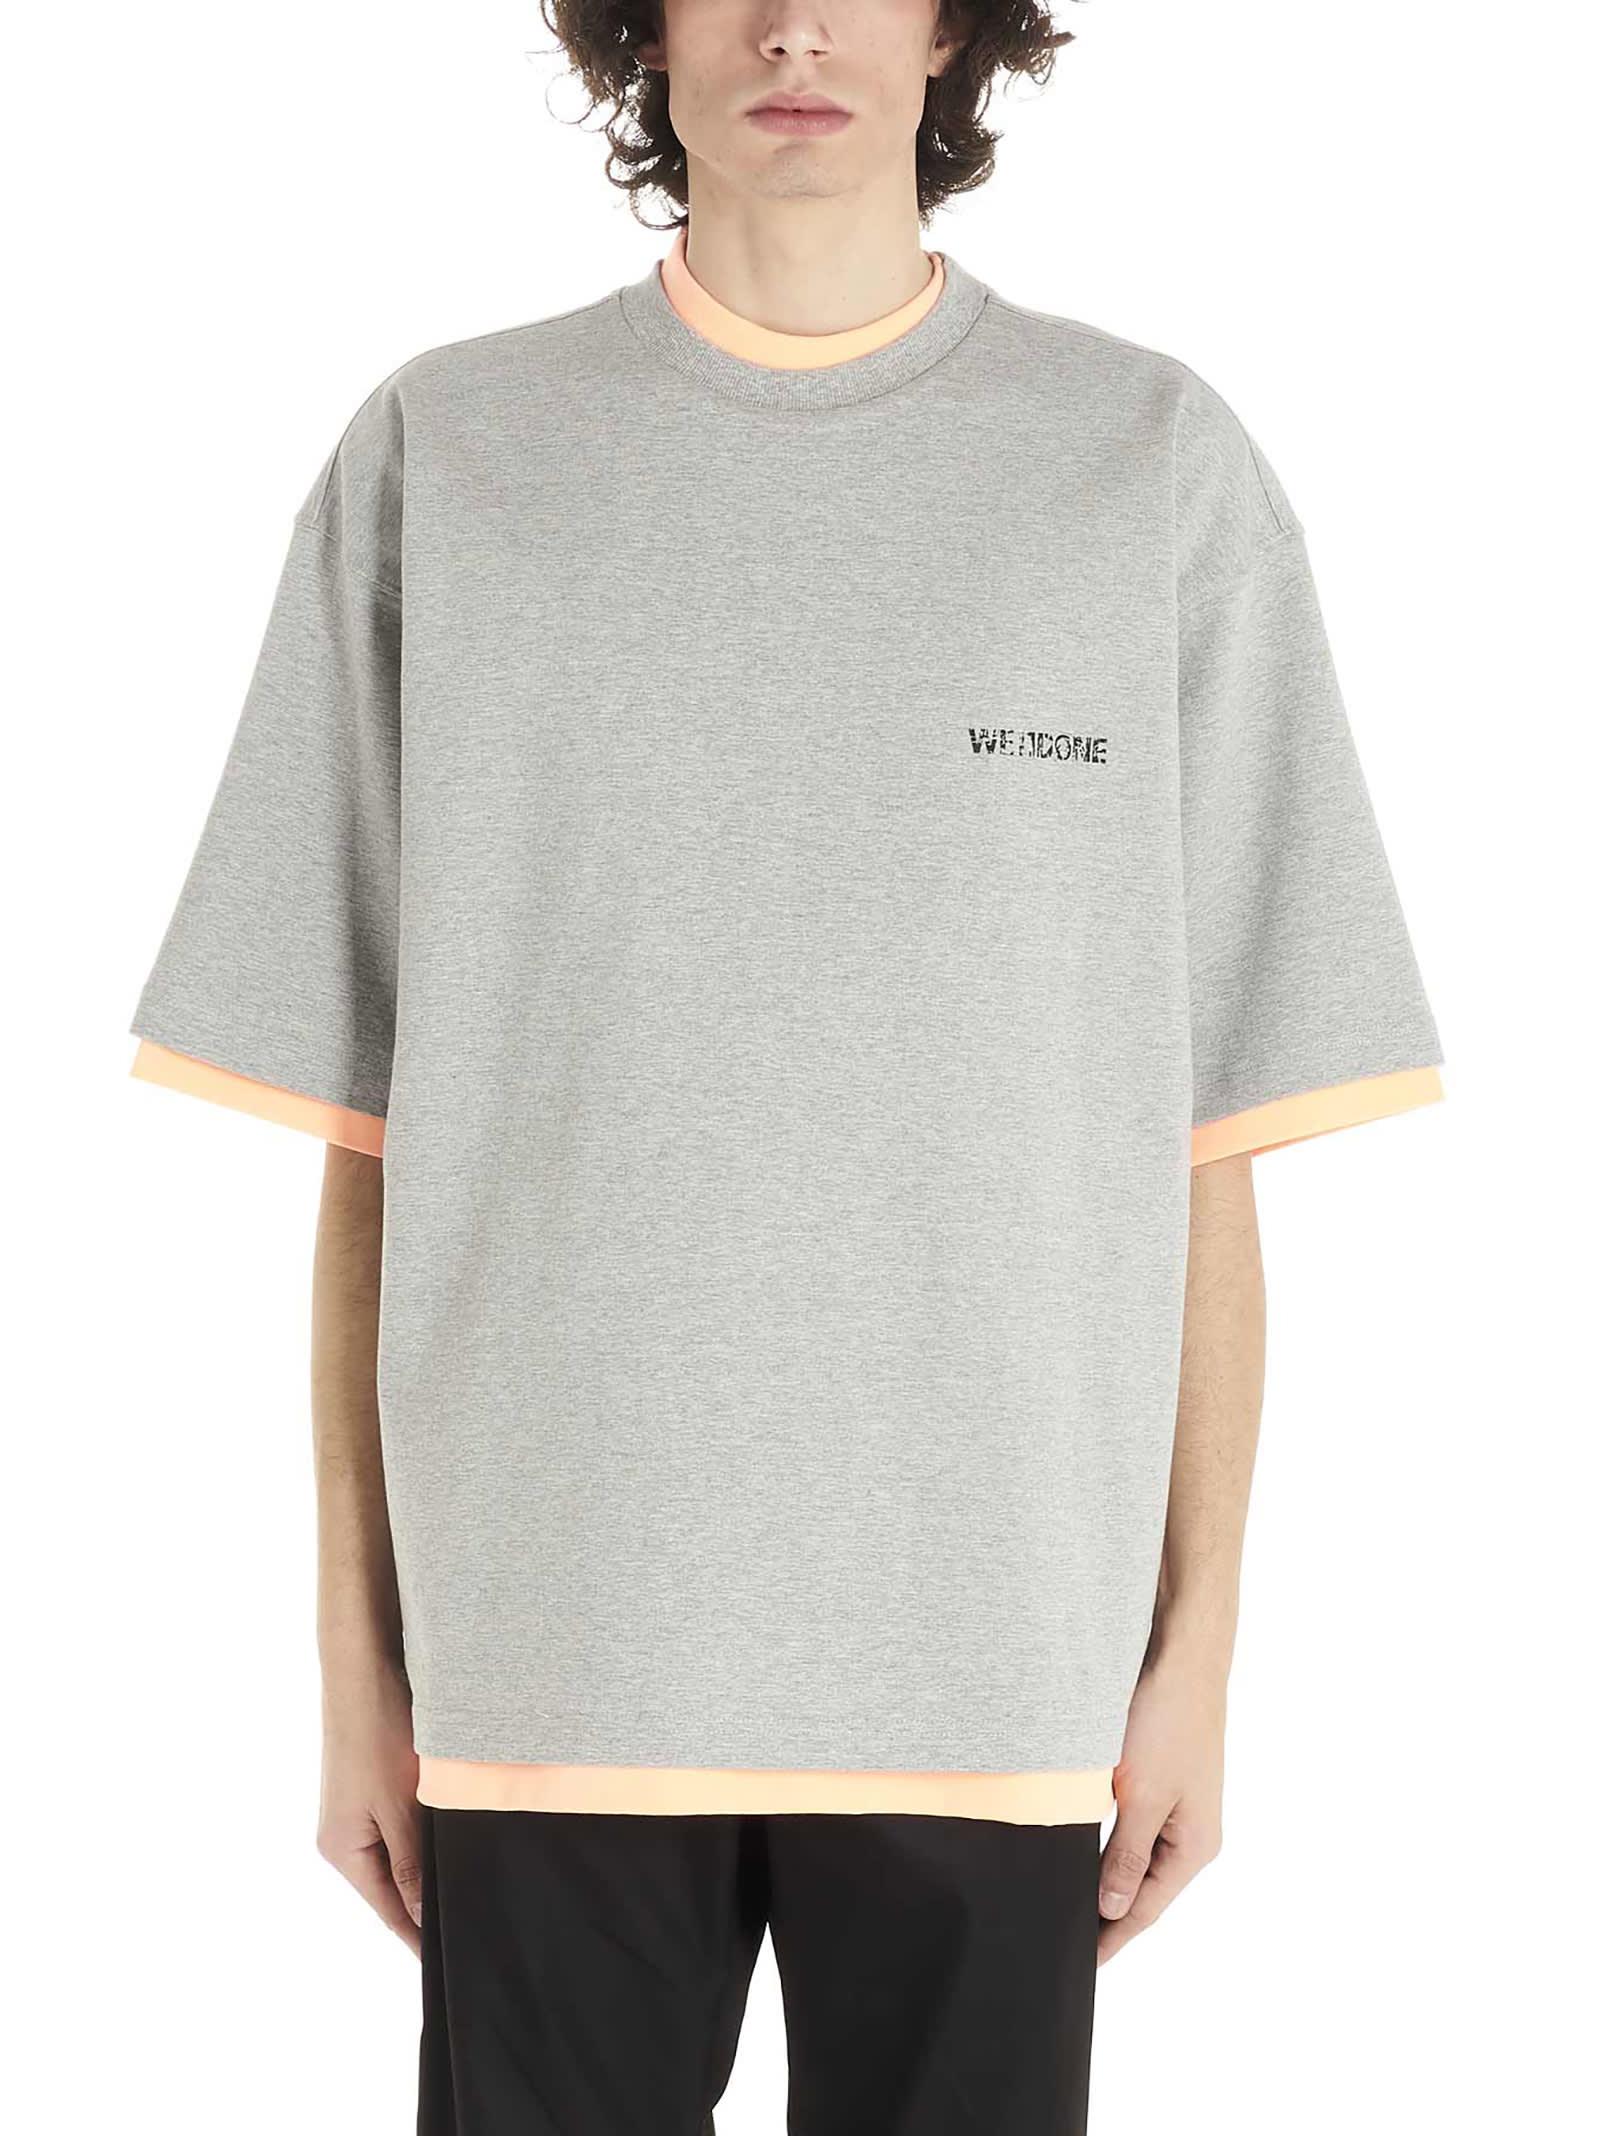 We11 Done gig T-shirt